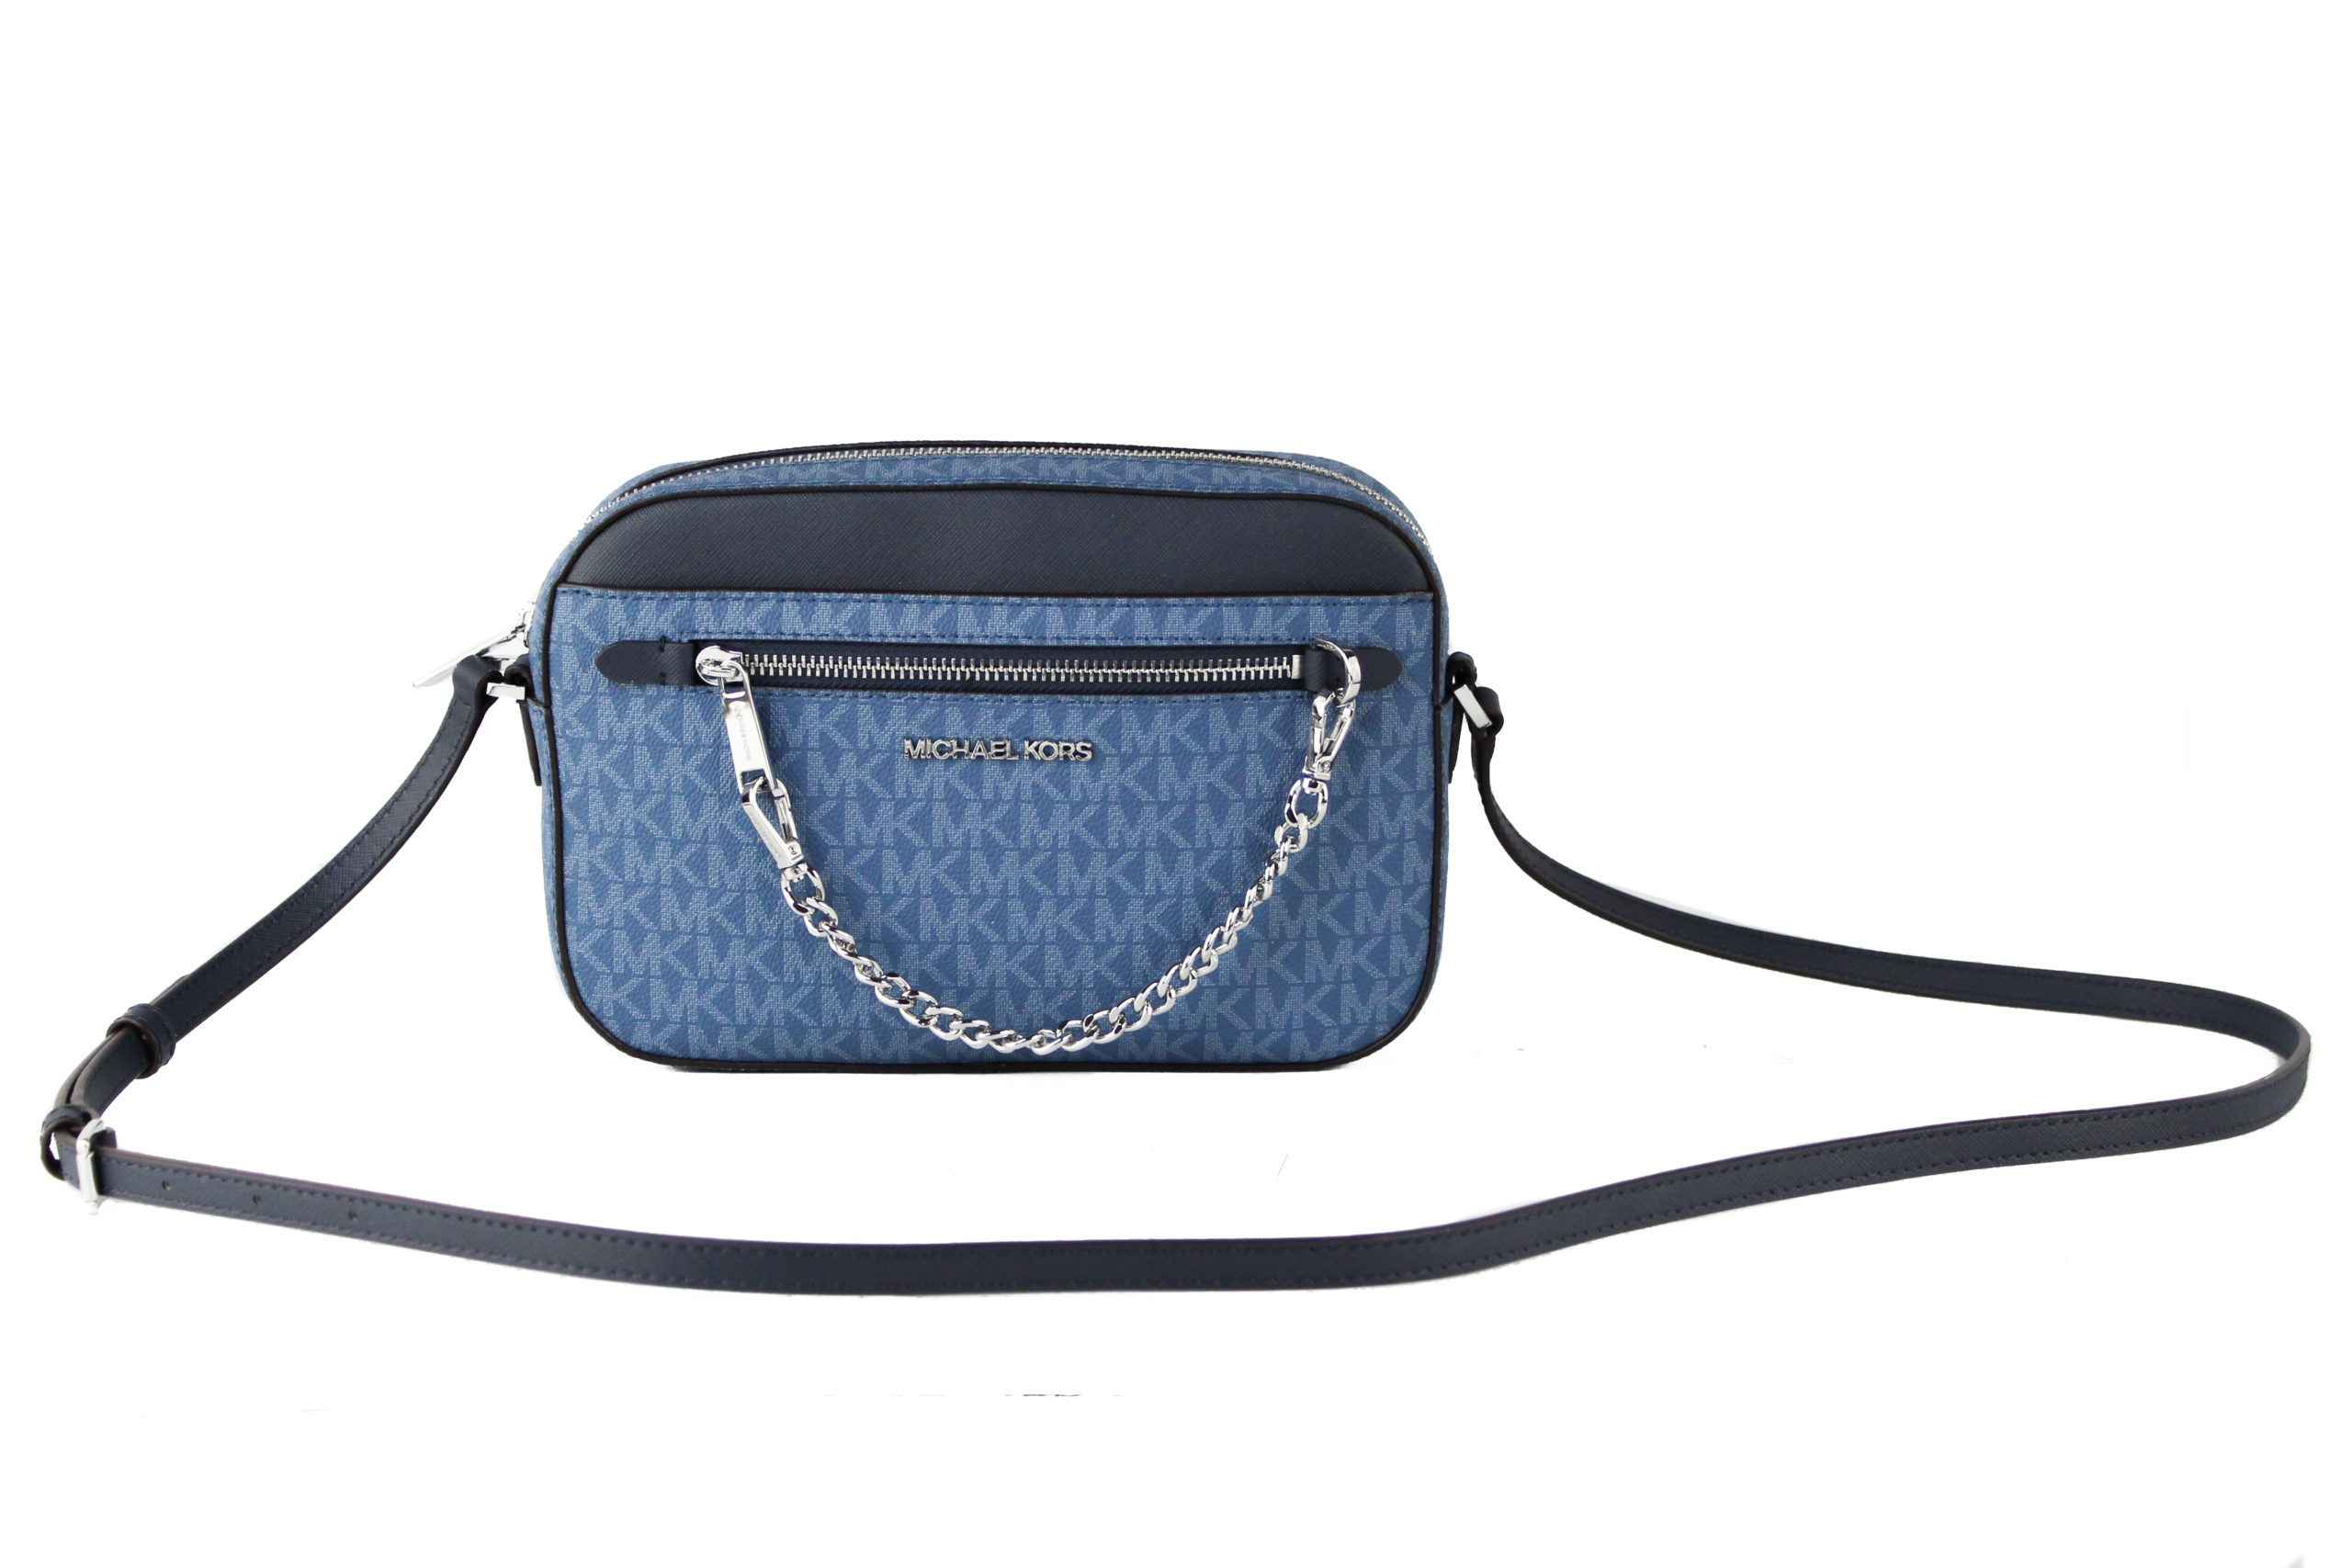 Michael Kors Women's Jet Set Item Crossbody Bag Blue 89815